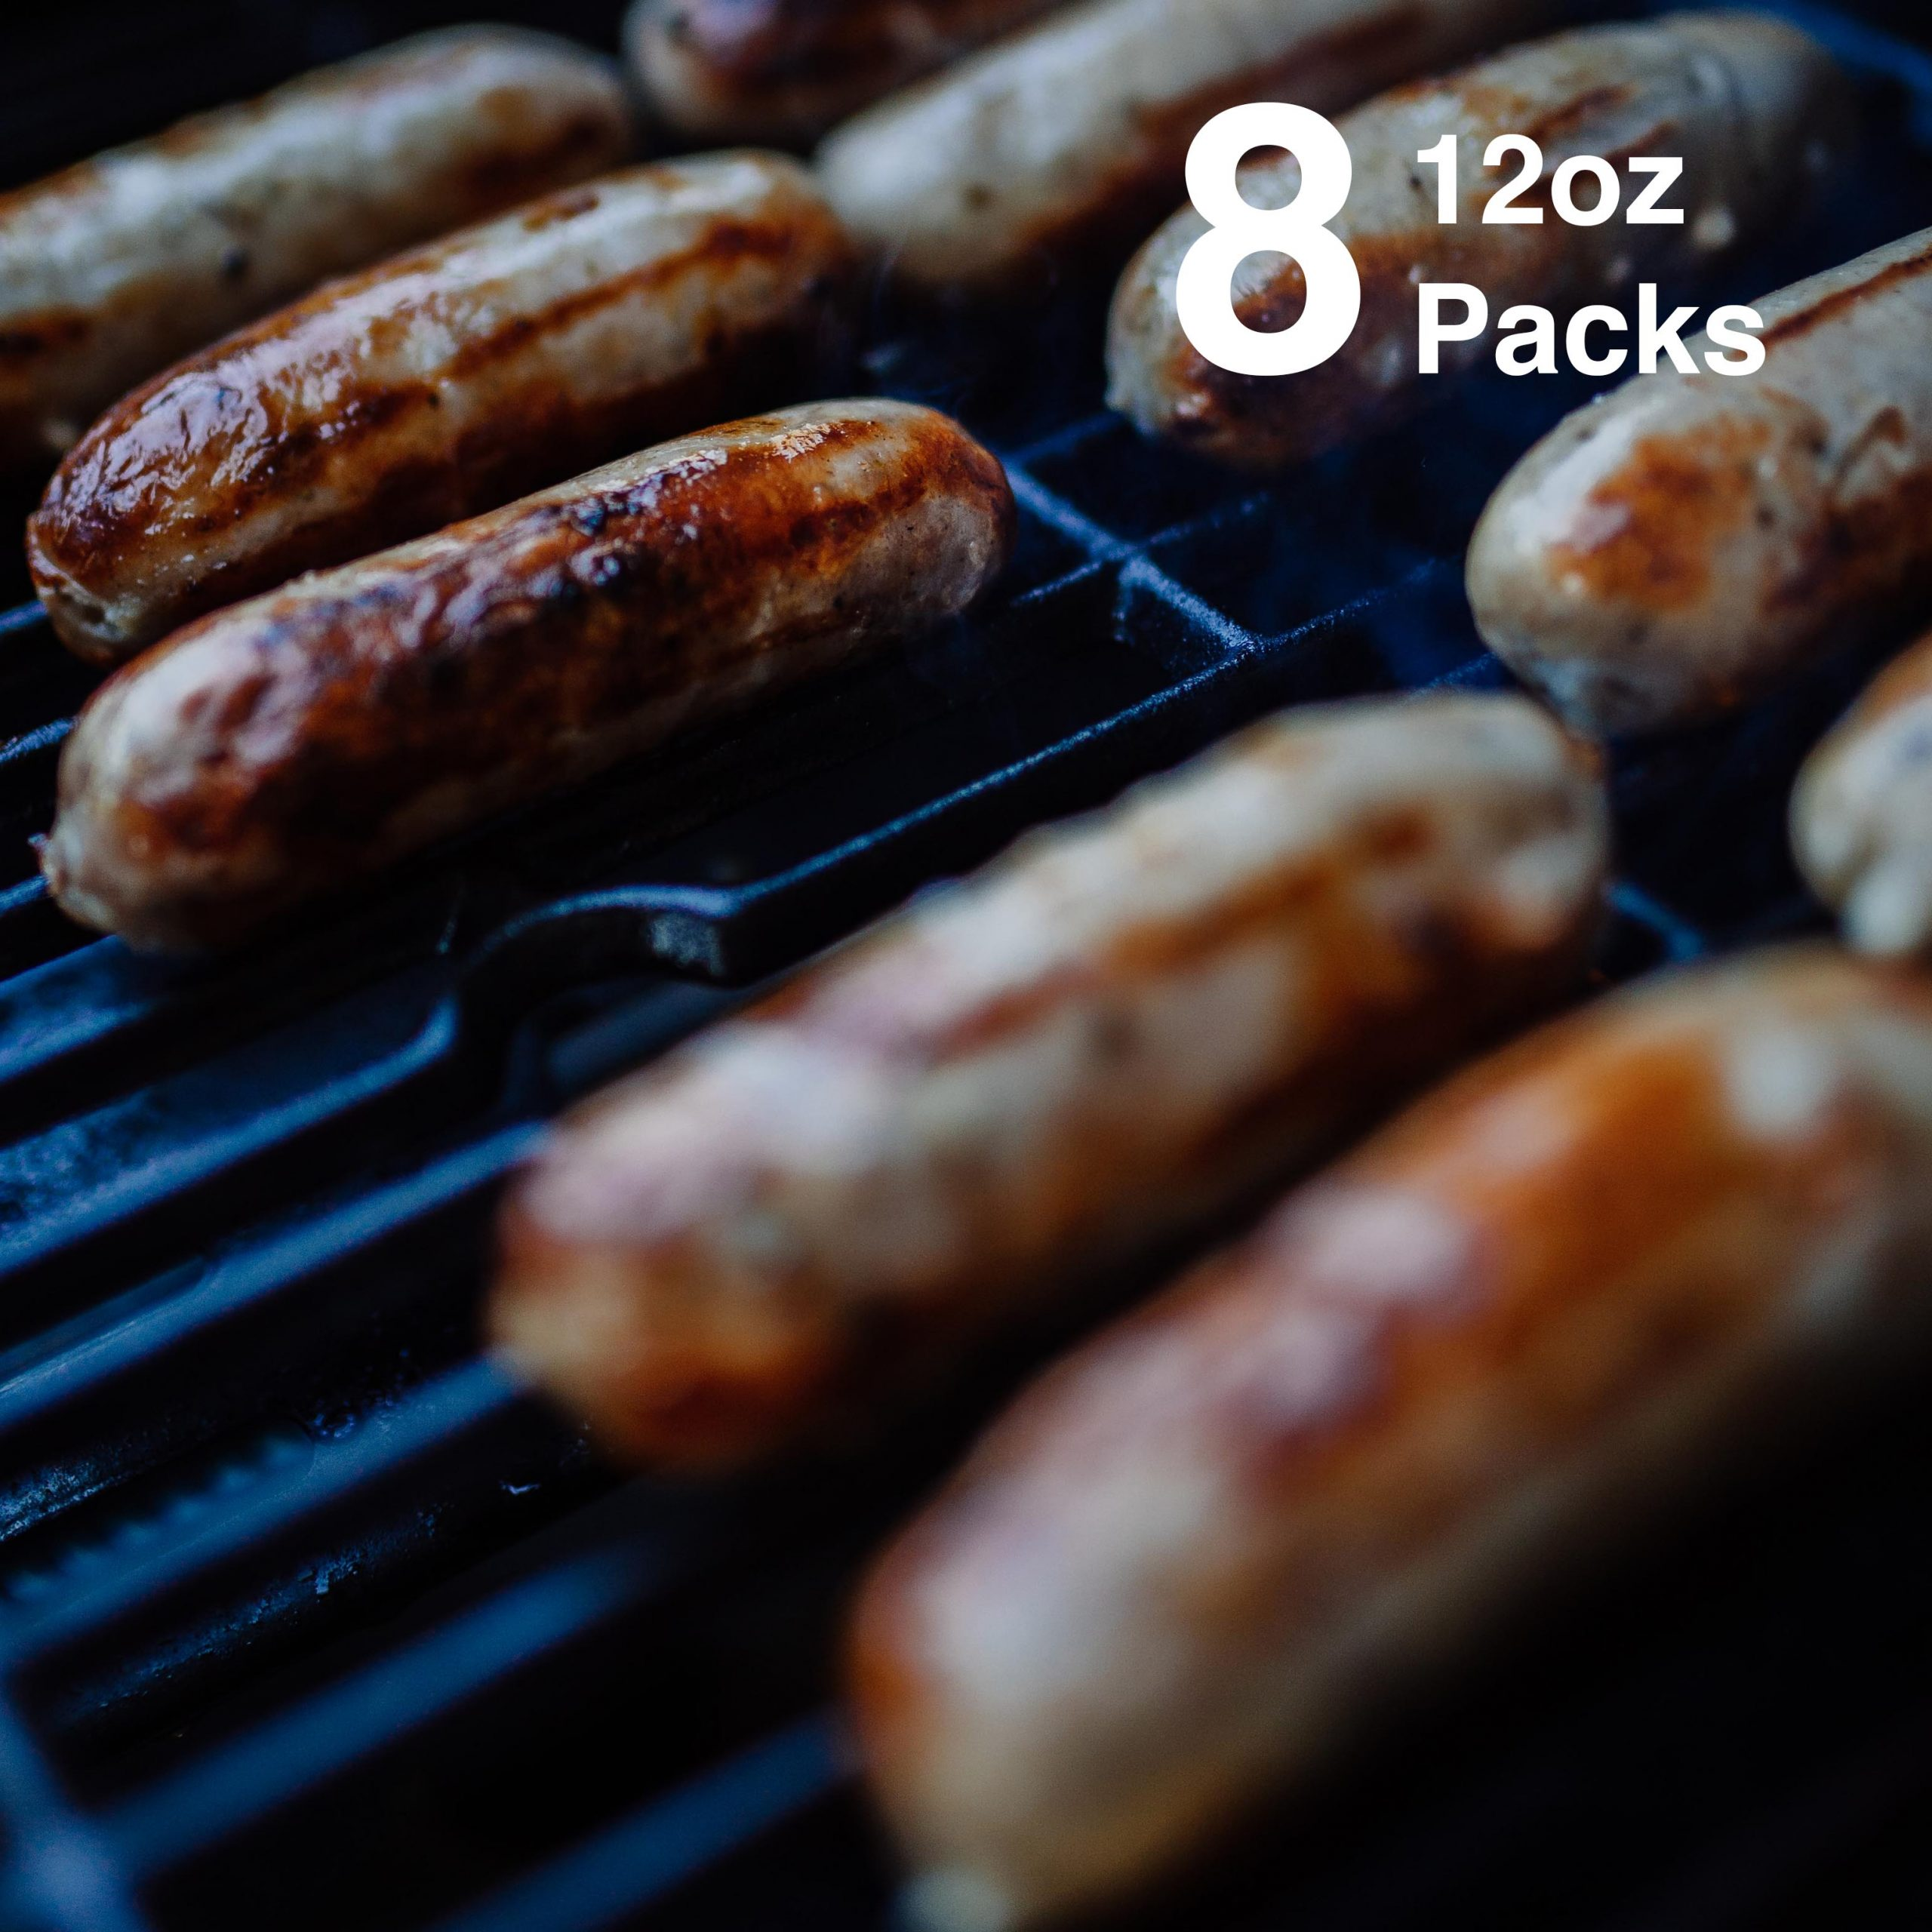 Sausage Variety Pack